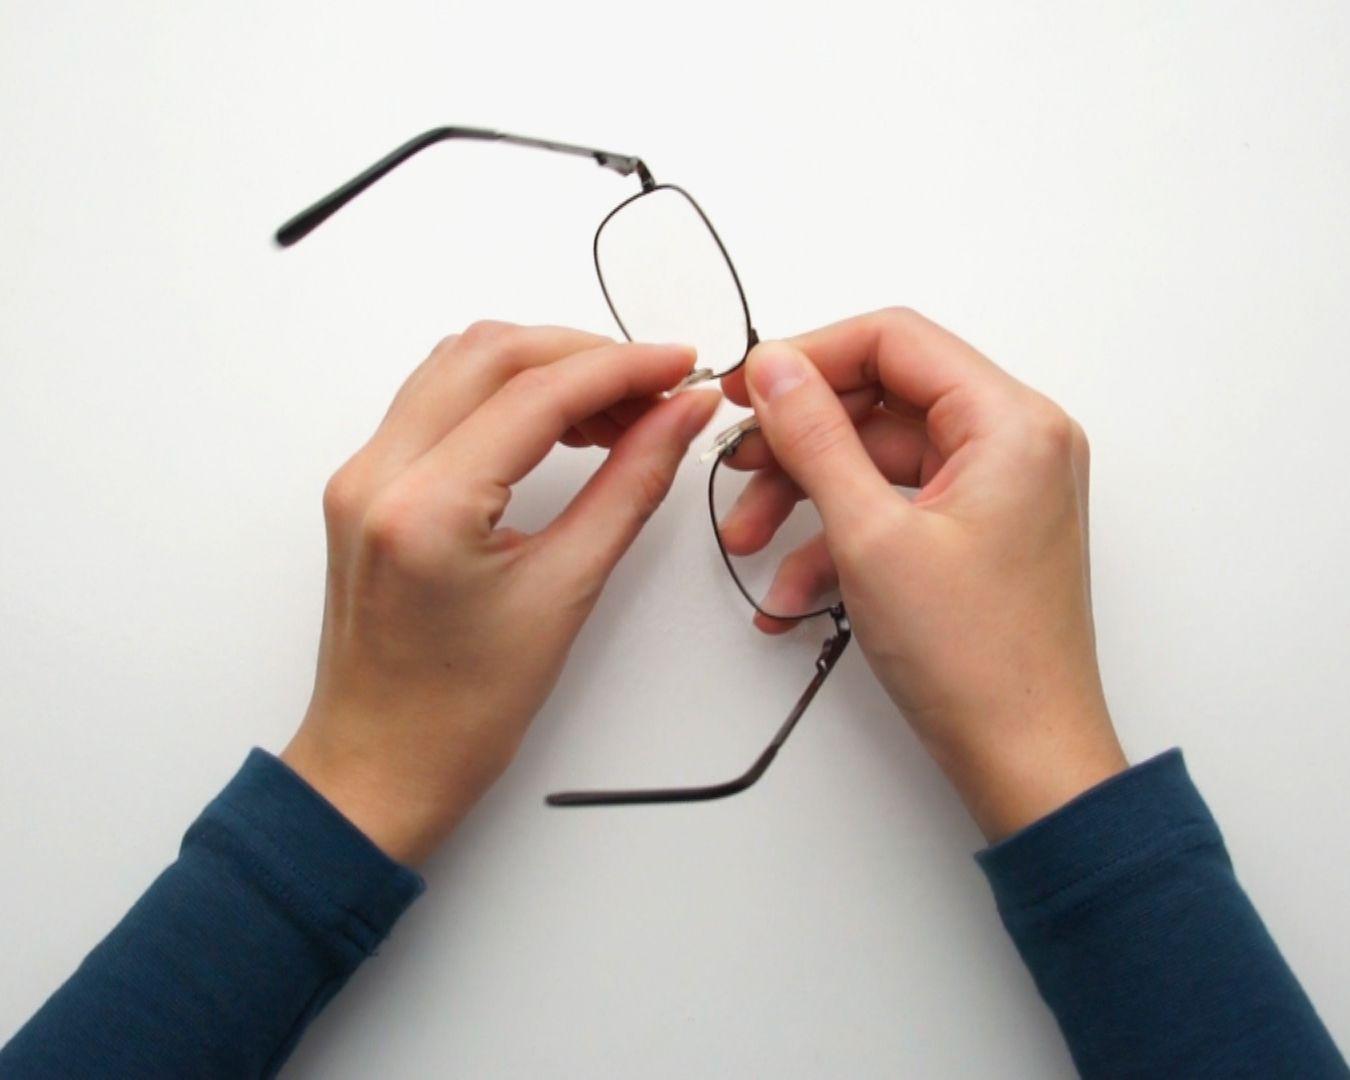 How To Adjust Eye Glasses Eye Glasses Case Prescription Safety Glasses Eyeglasses